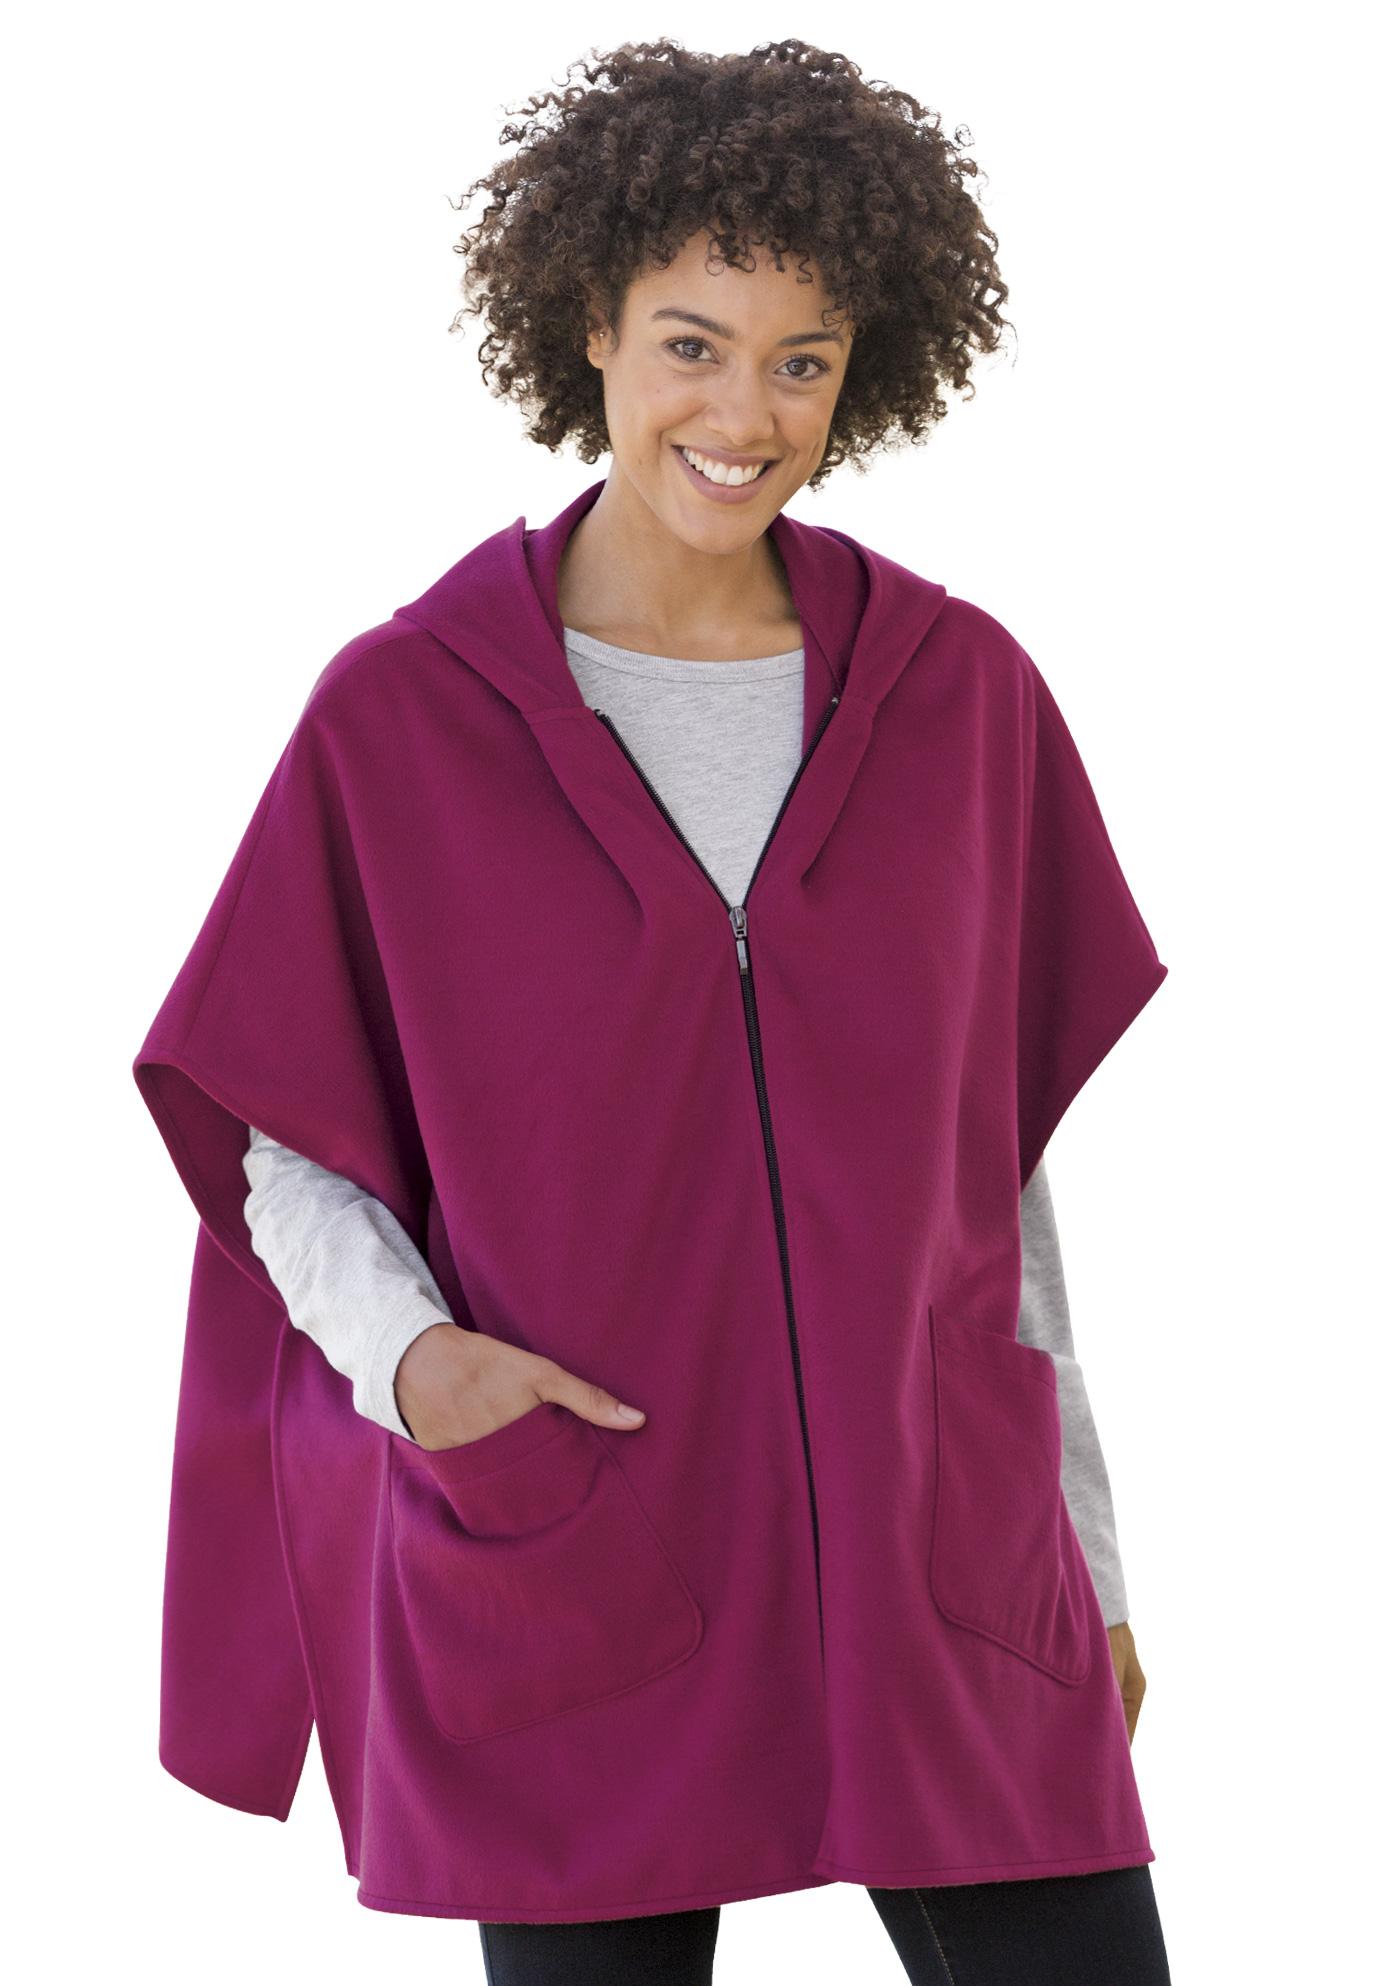 39ebaca3a4bdb4 Hooded fleece poncho